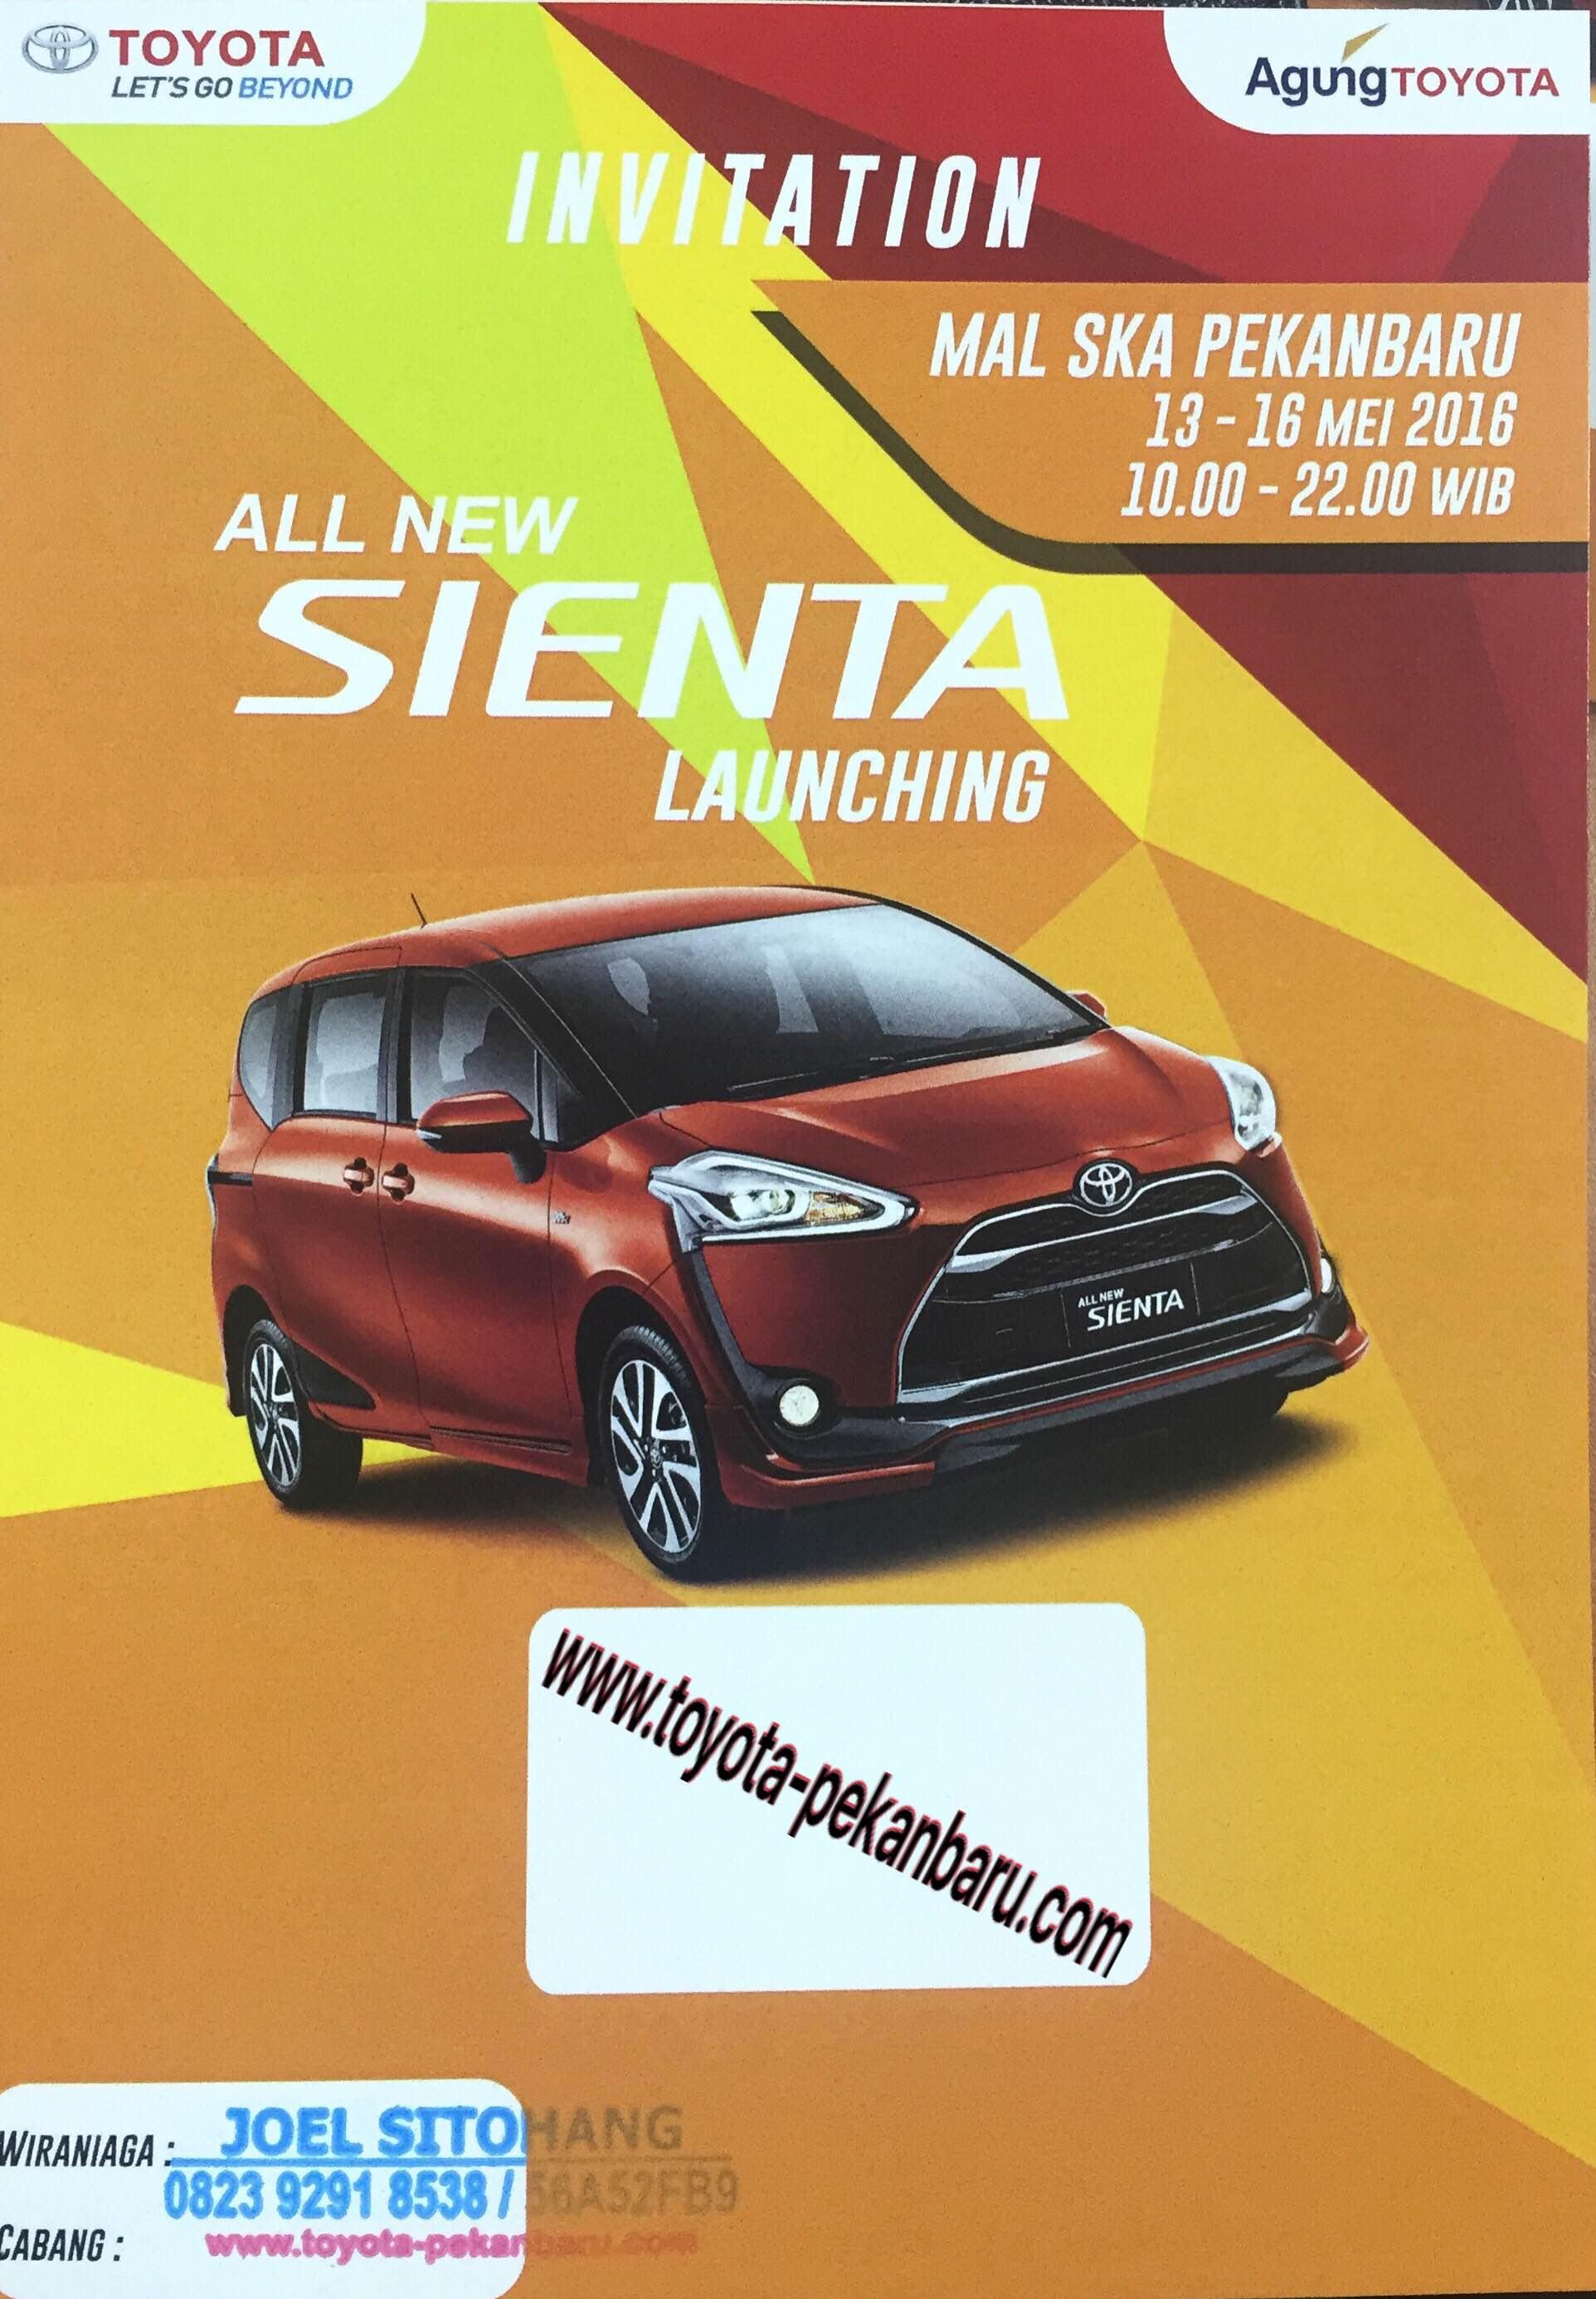 Launching dan Promo Toyota Sienta Pekanbaru